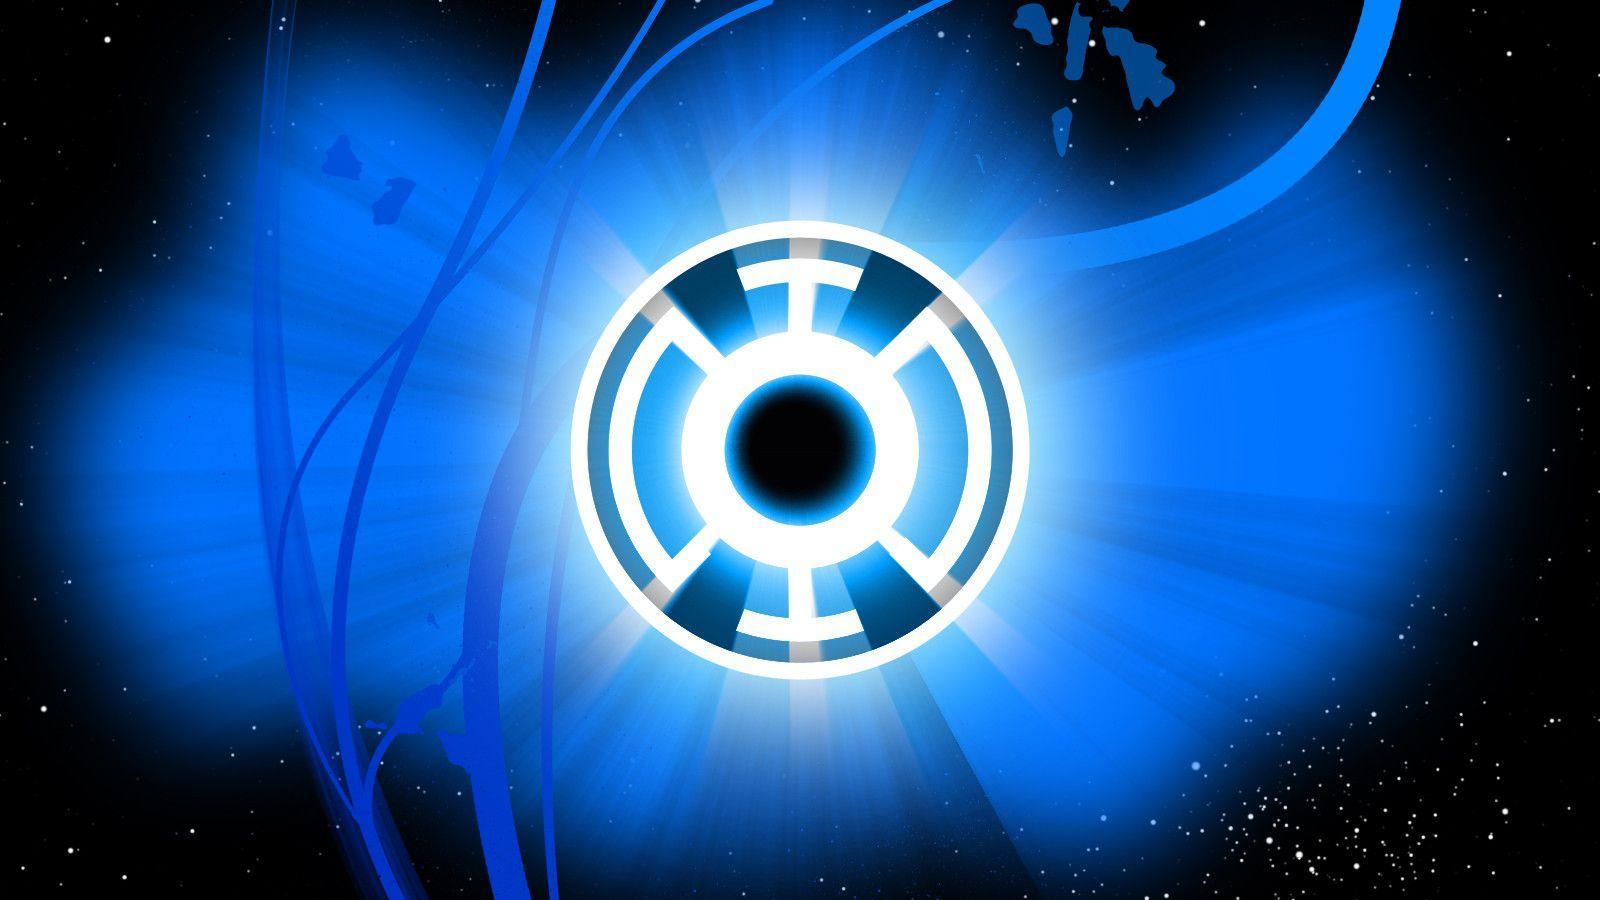 Blue Lantern Wallpapers 1600x900